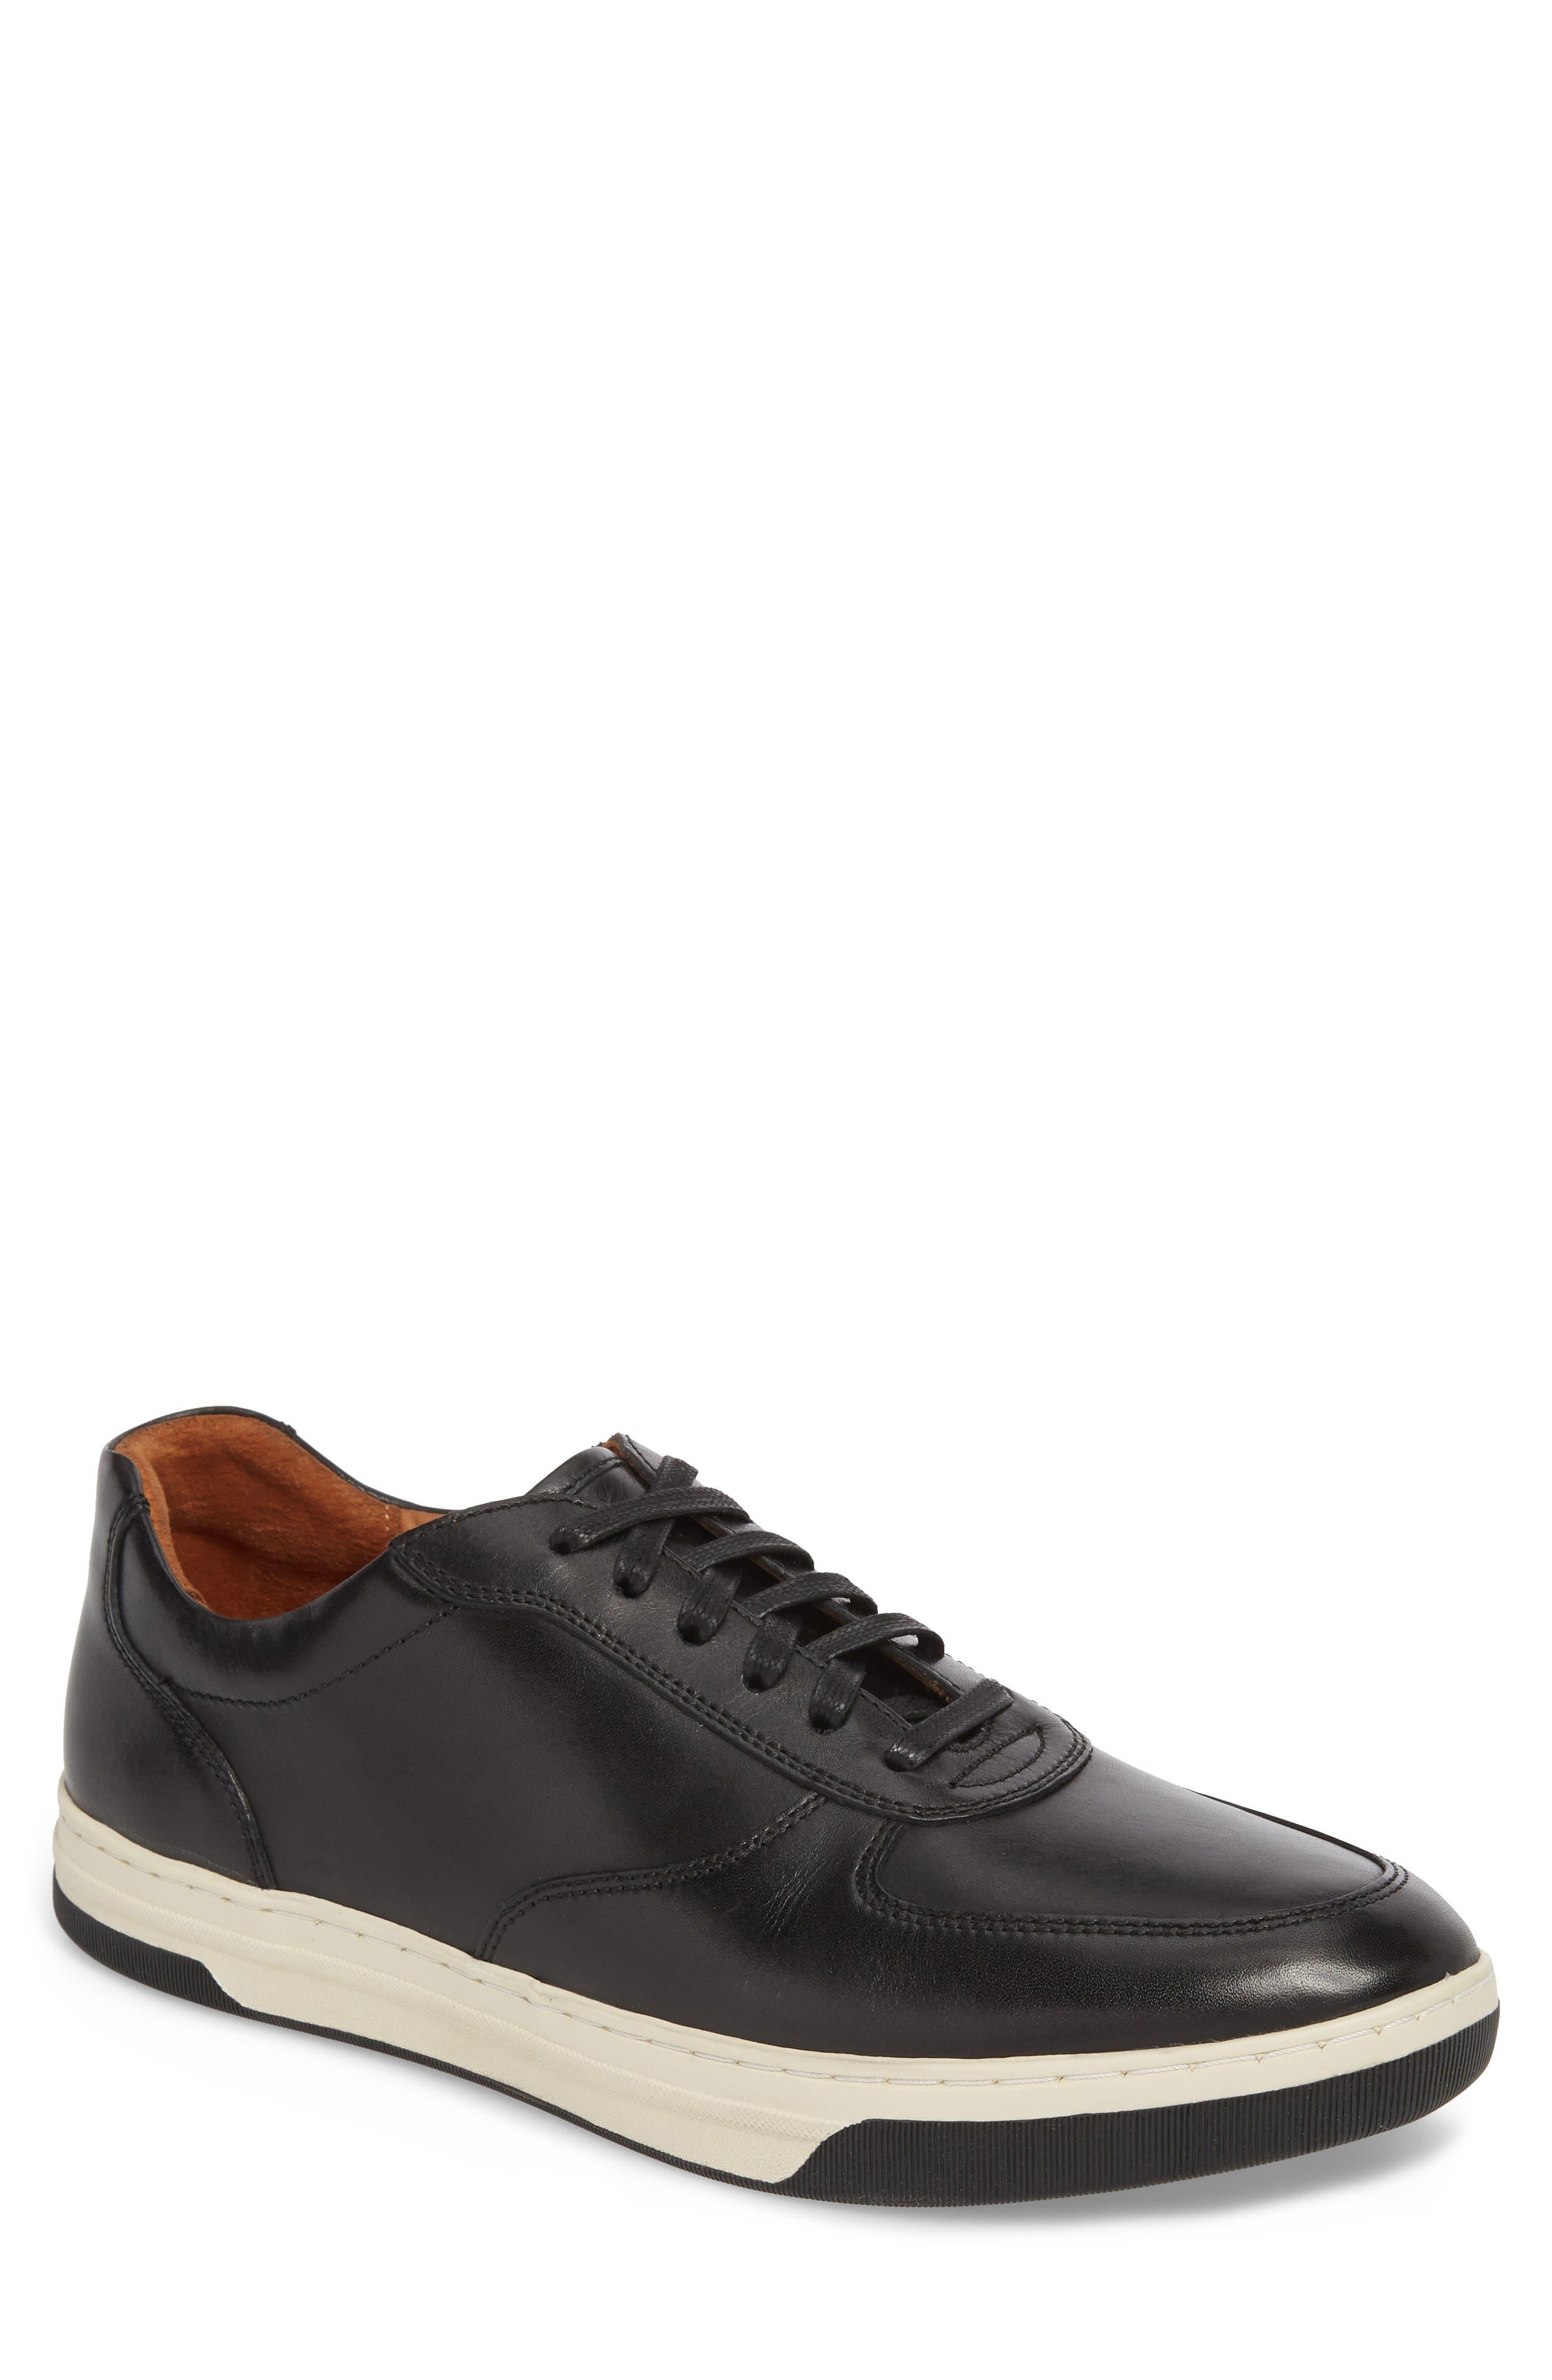 Fenton Low Top Sneaker,                             Main thumbnail 1, color,                             BLACK LEATHER